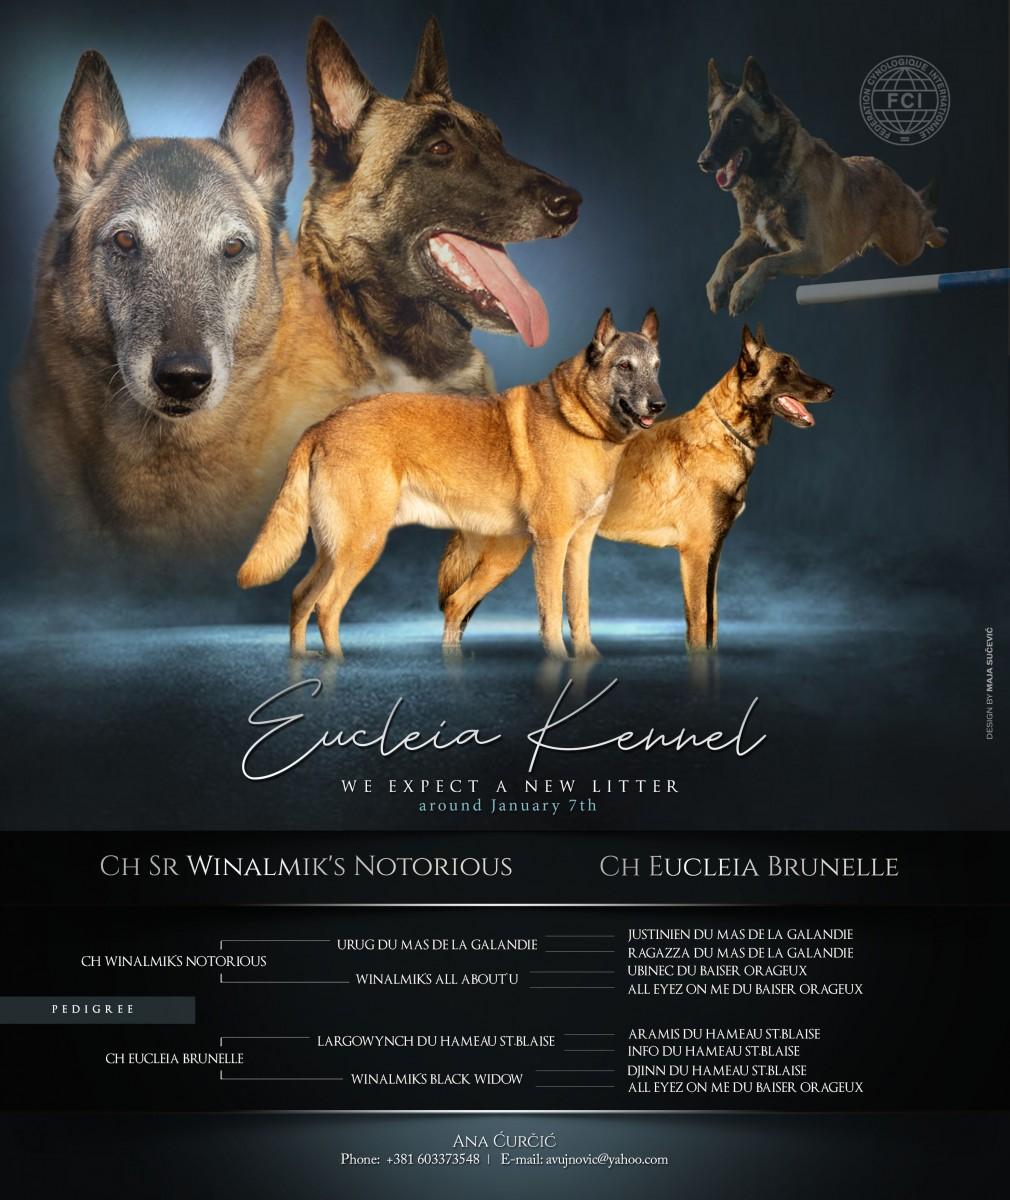 New Eucleia litter BELGIAN SHEPHERD DOG Malinois